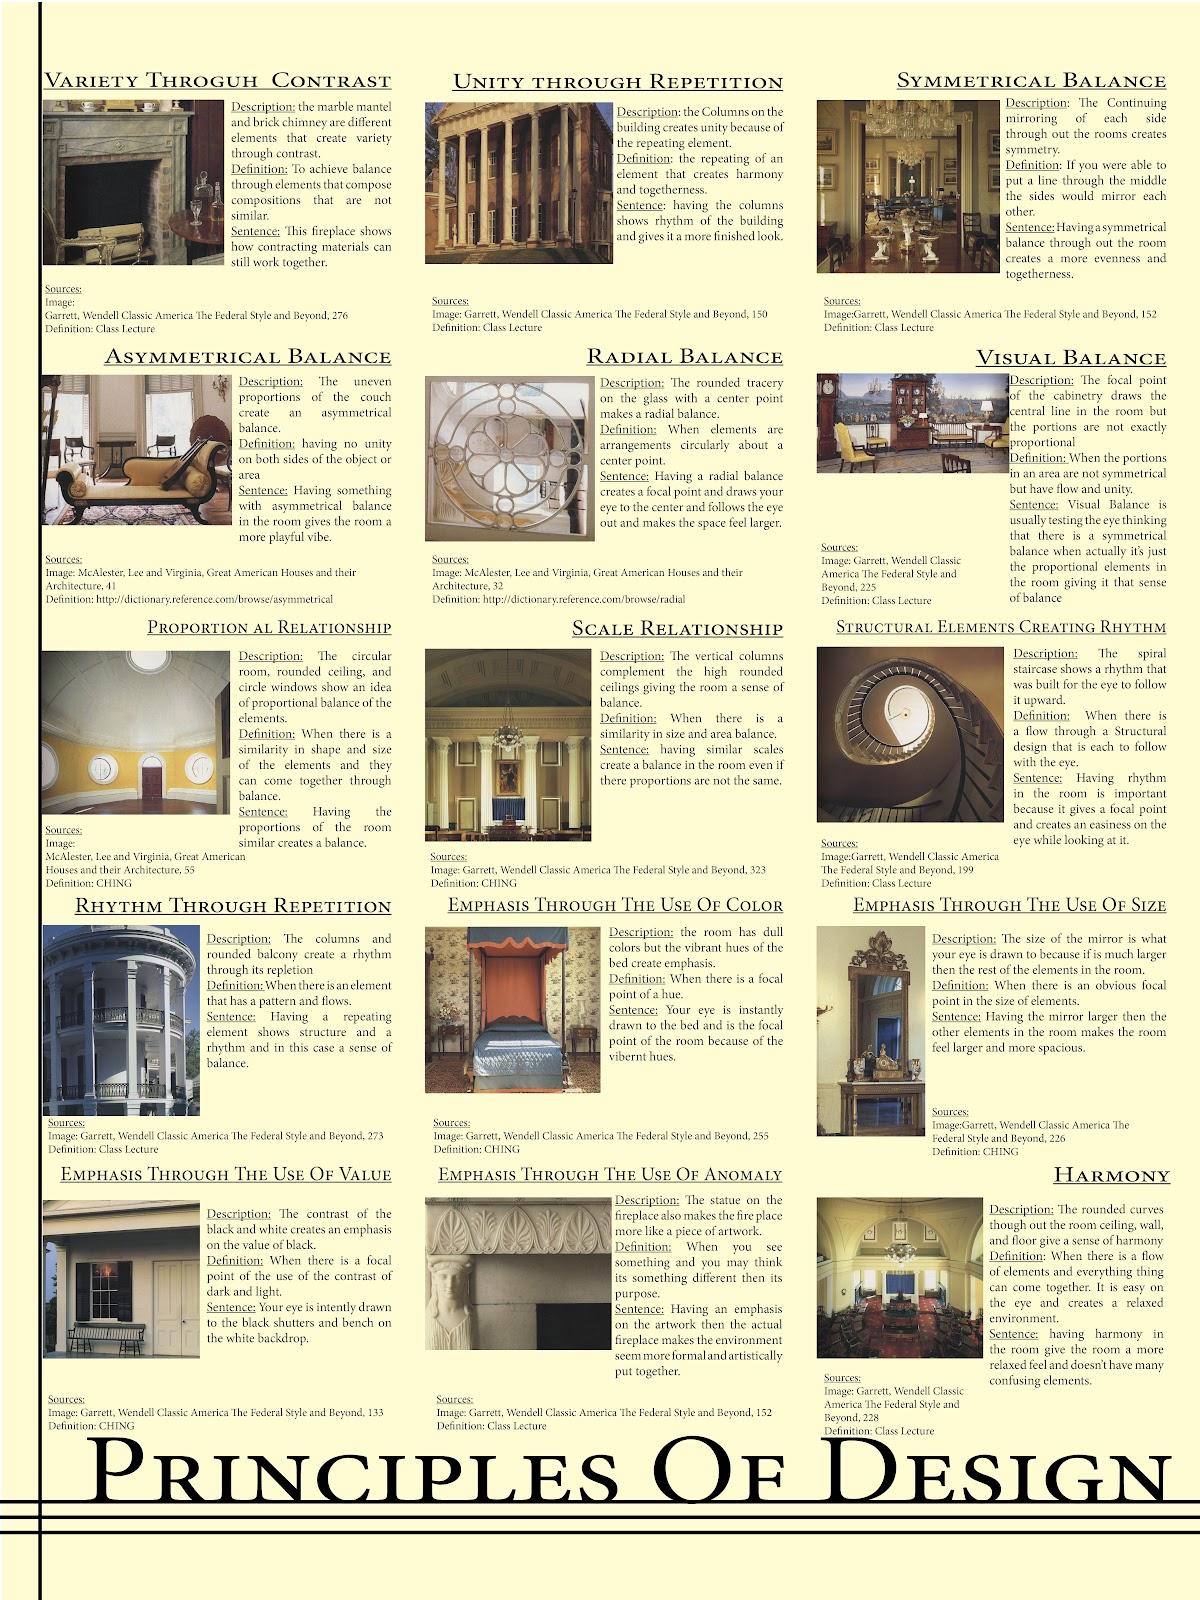 Michelle Hanna Interior Design Portfolio: Elements and ...